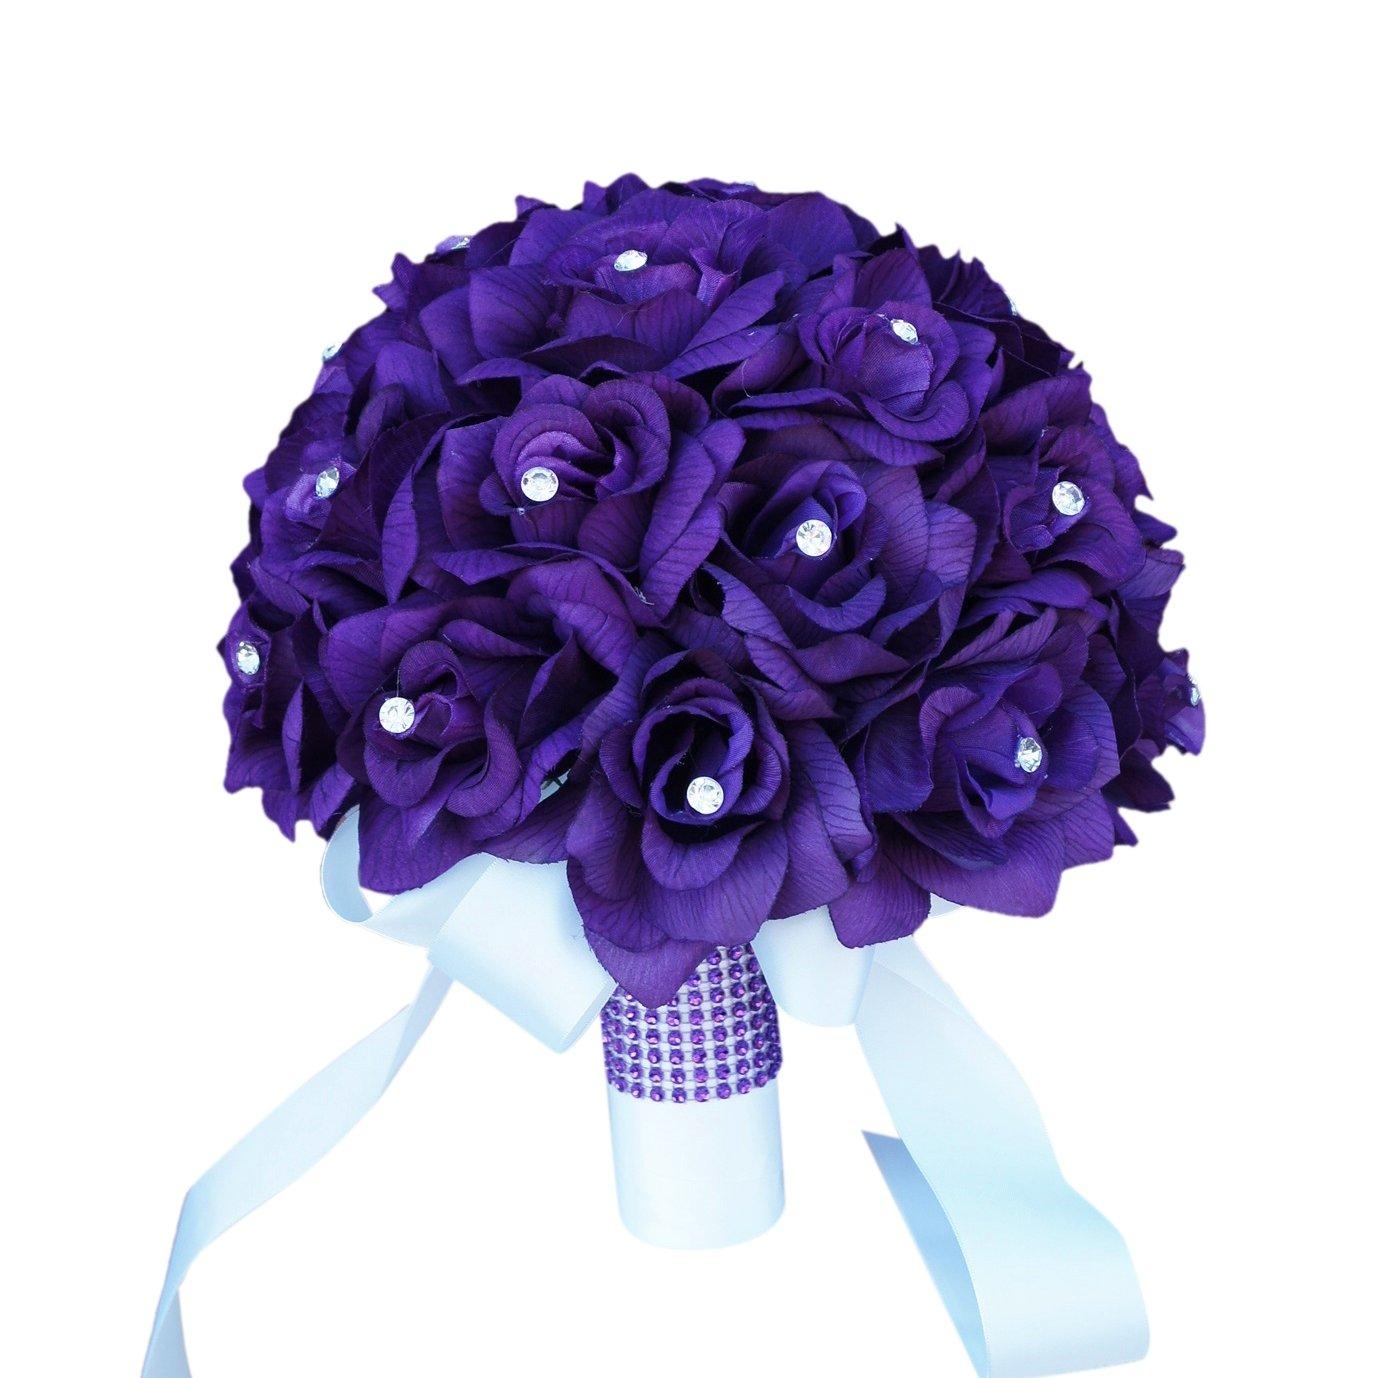 Amazon purple roses bridal wedding bouquet with ivory stain amazon purple roses bridal wedding bouquet with ivory stain ribbon handle home kitchen izmirmasajfo